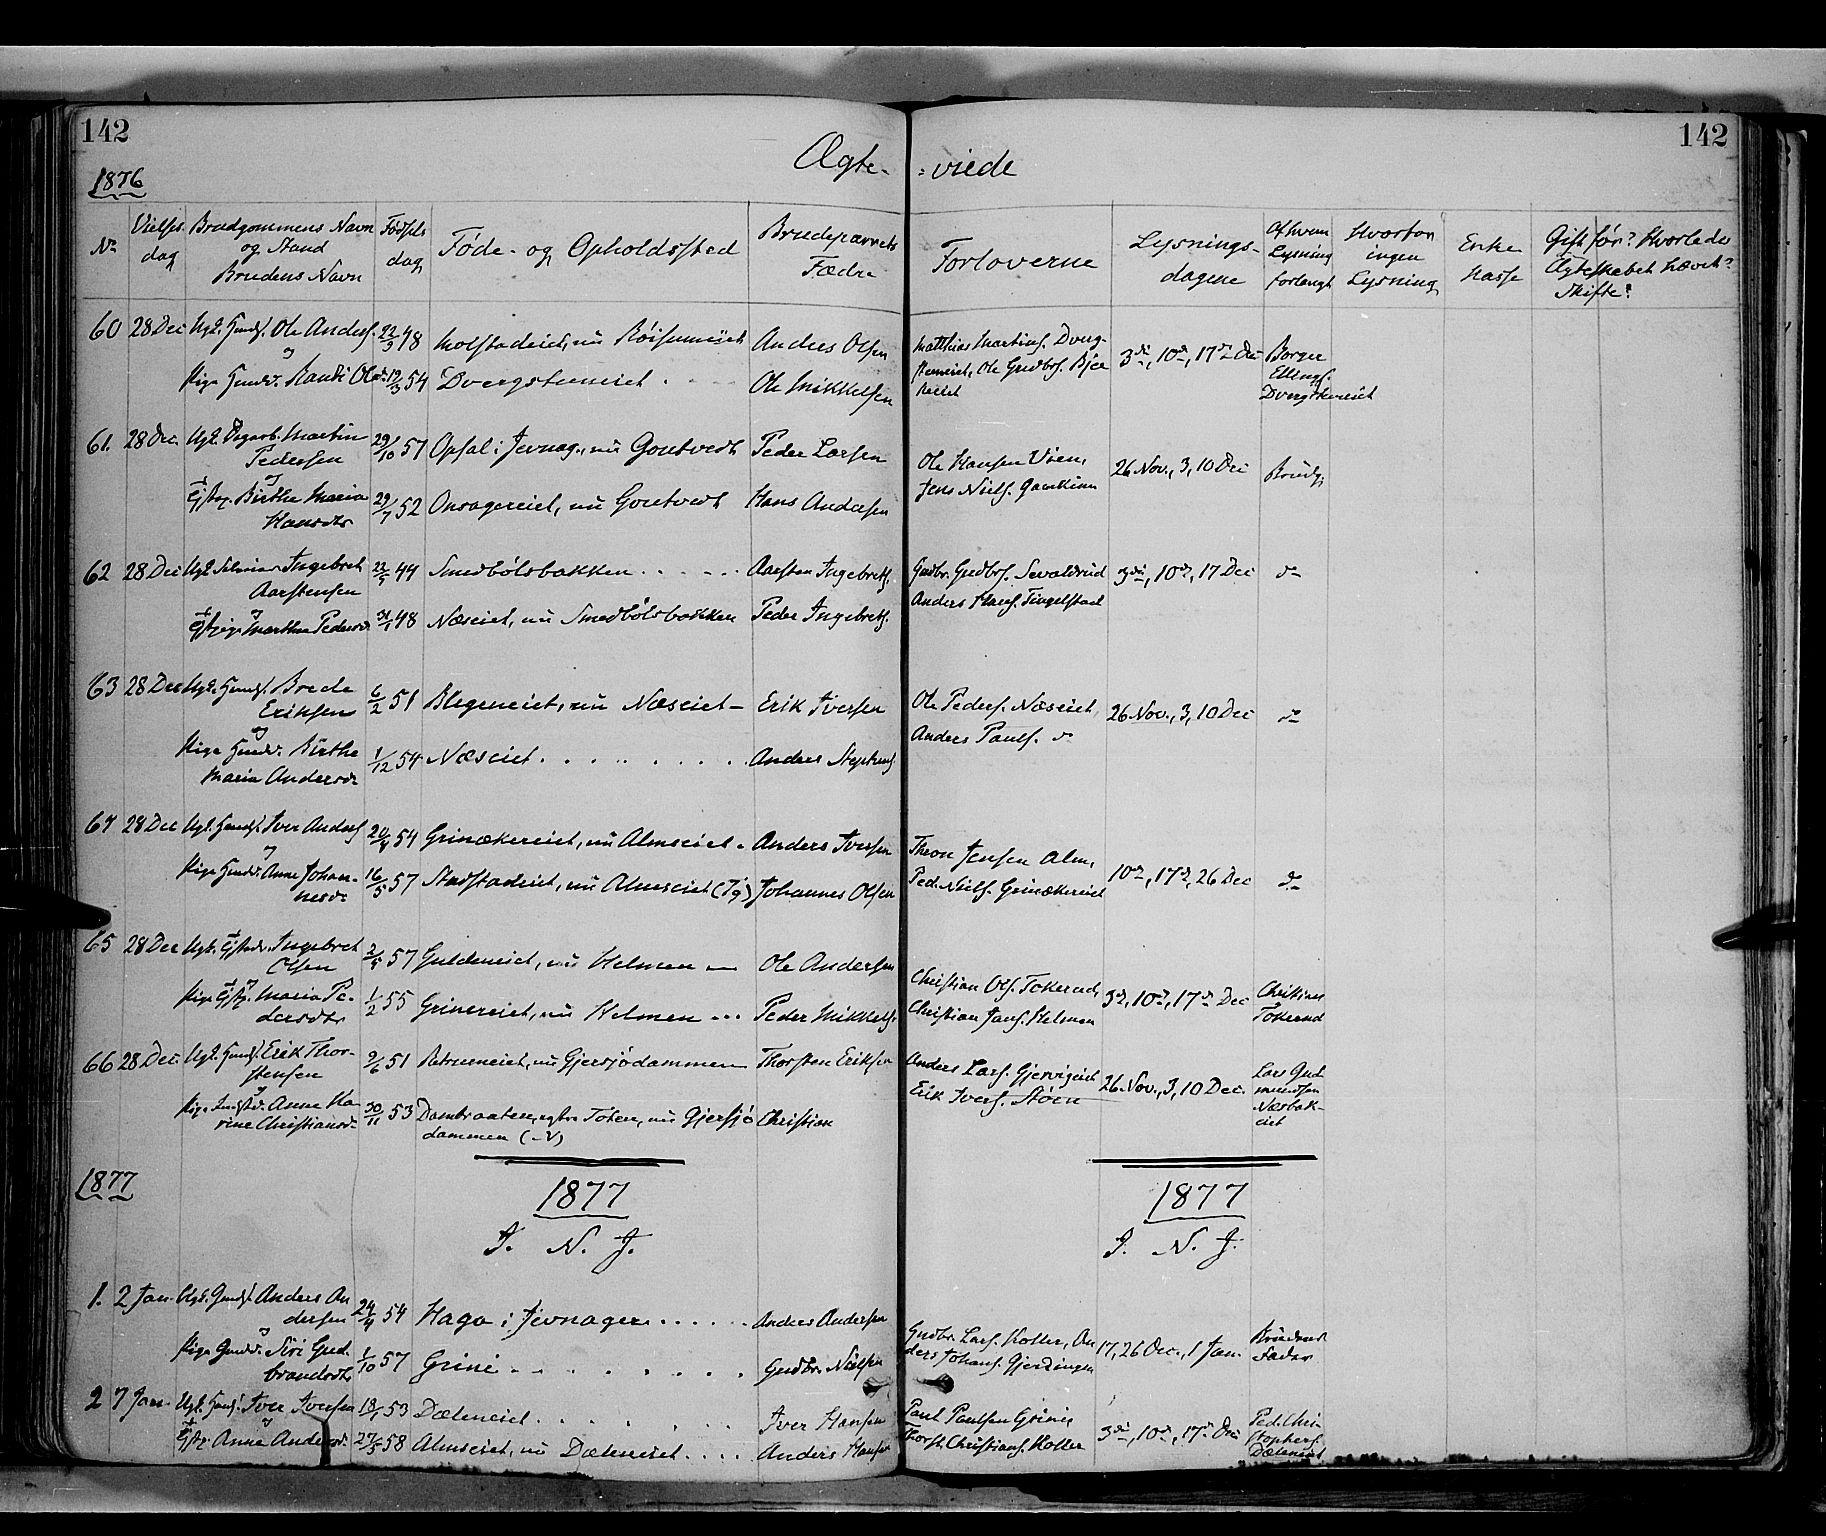 SAH, Gran prestekontor, Ministerialbok nr. 13, 1875-1879, s. 142